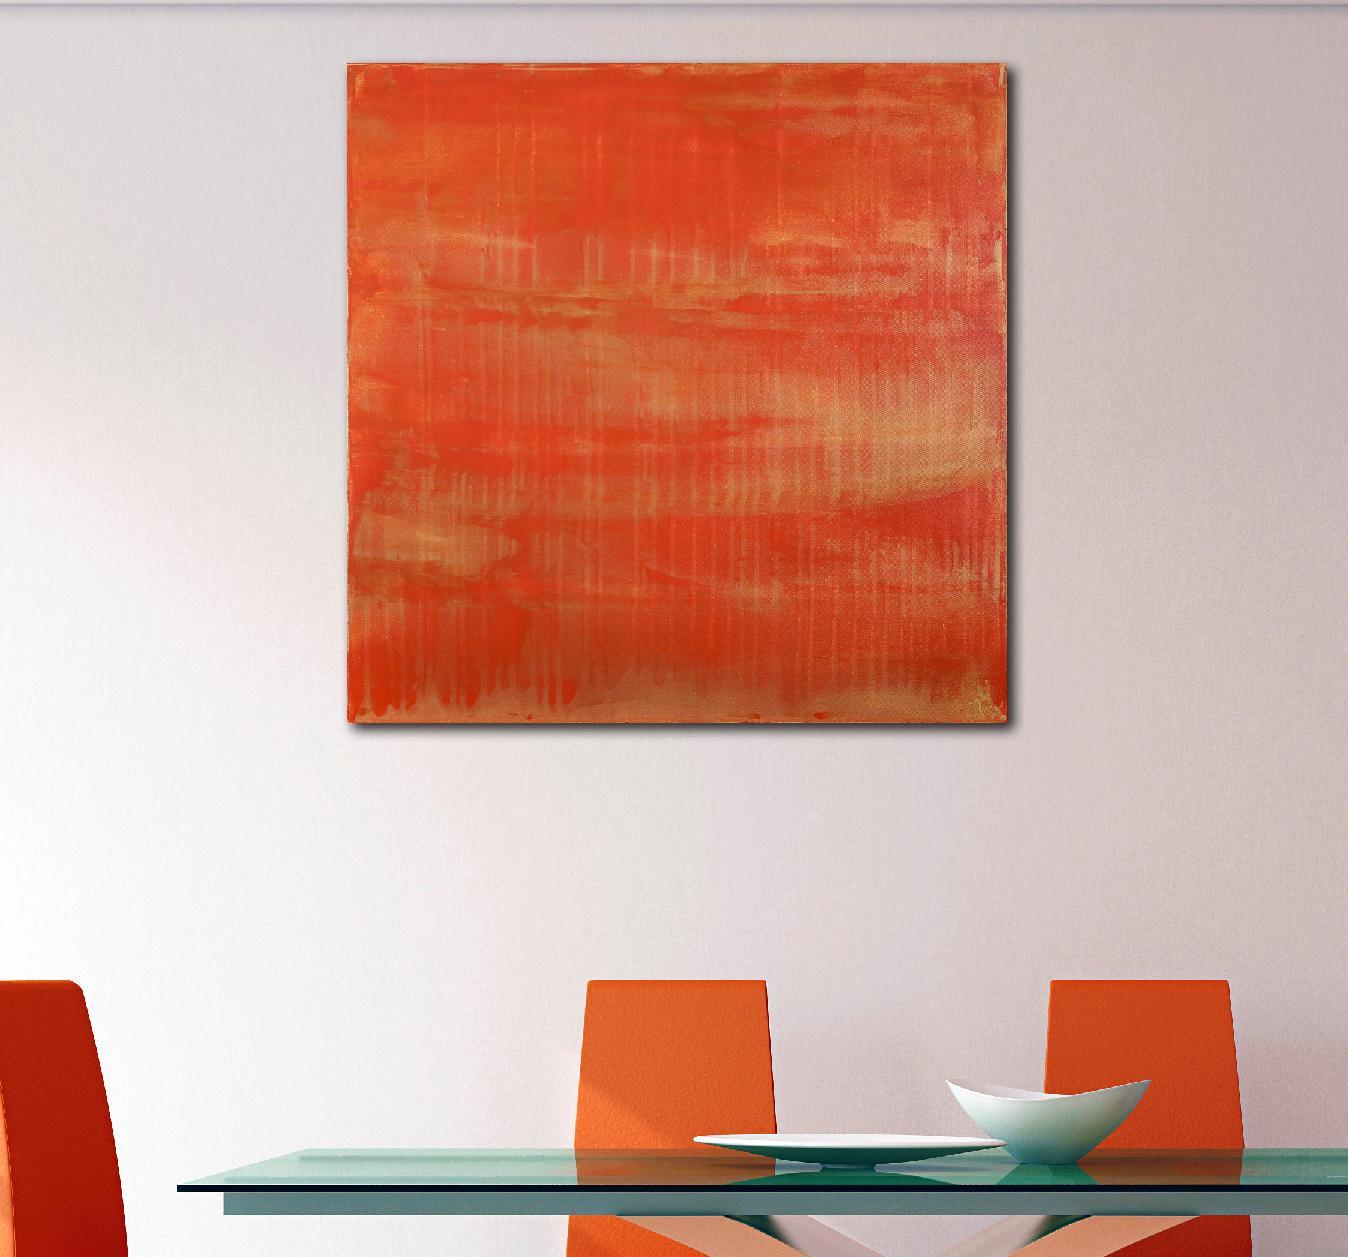 Sunset paradise 5 (Metallic Orange Spectra) - Nestor Toro 2020